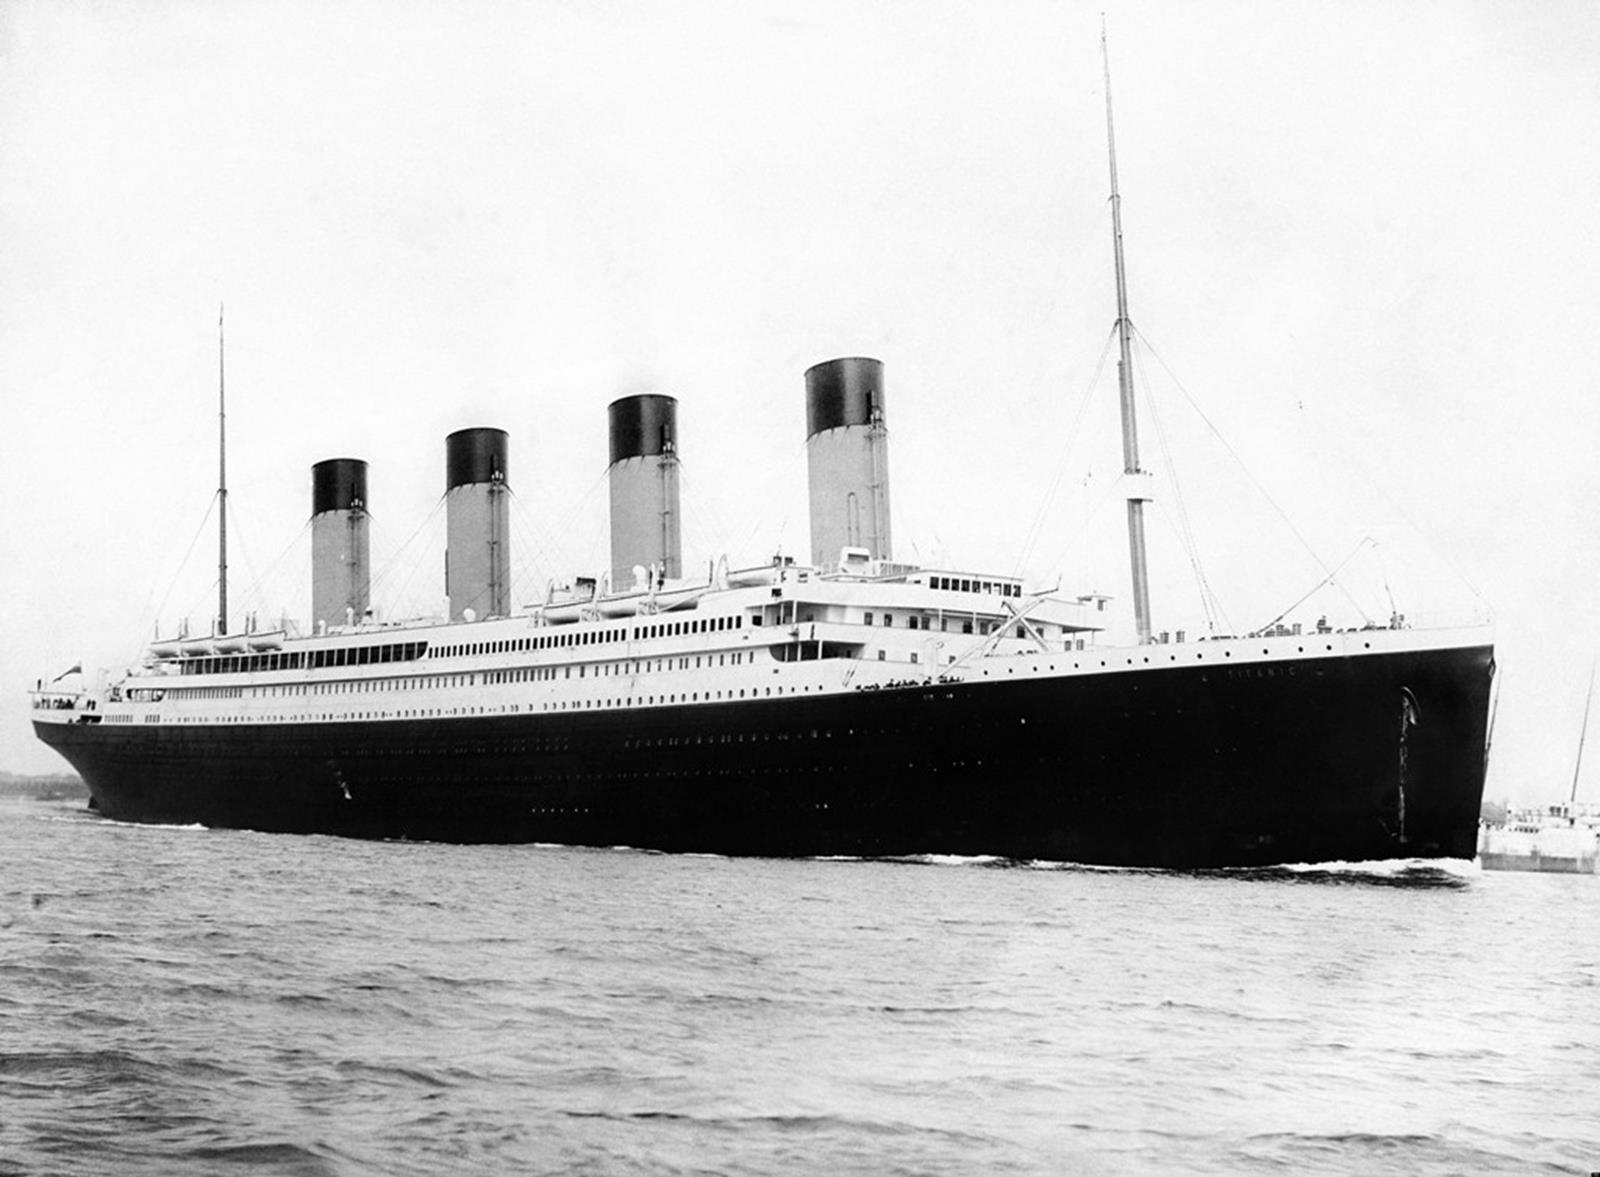 An original photograph of Titanic. Credit: F.G.O. Stuart at en.wikipedia